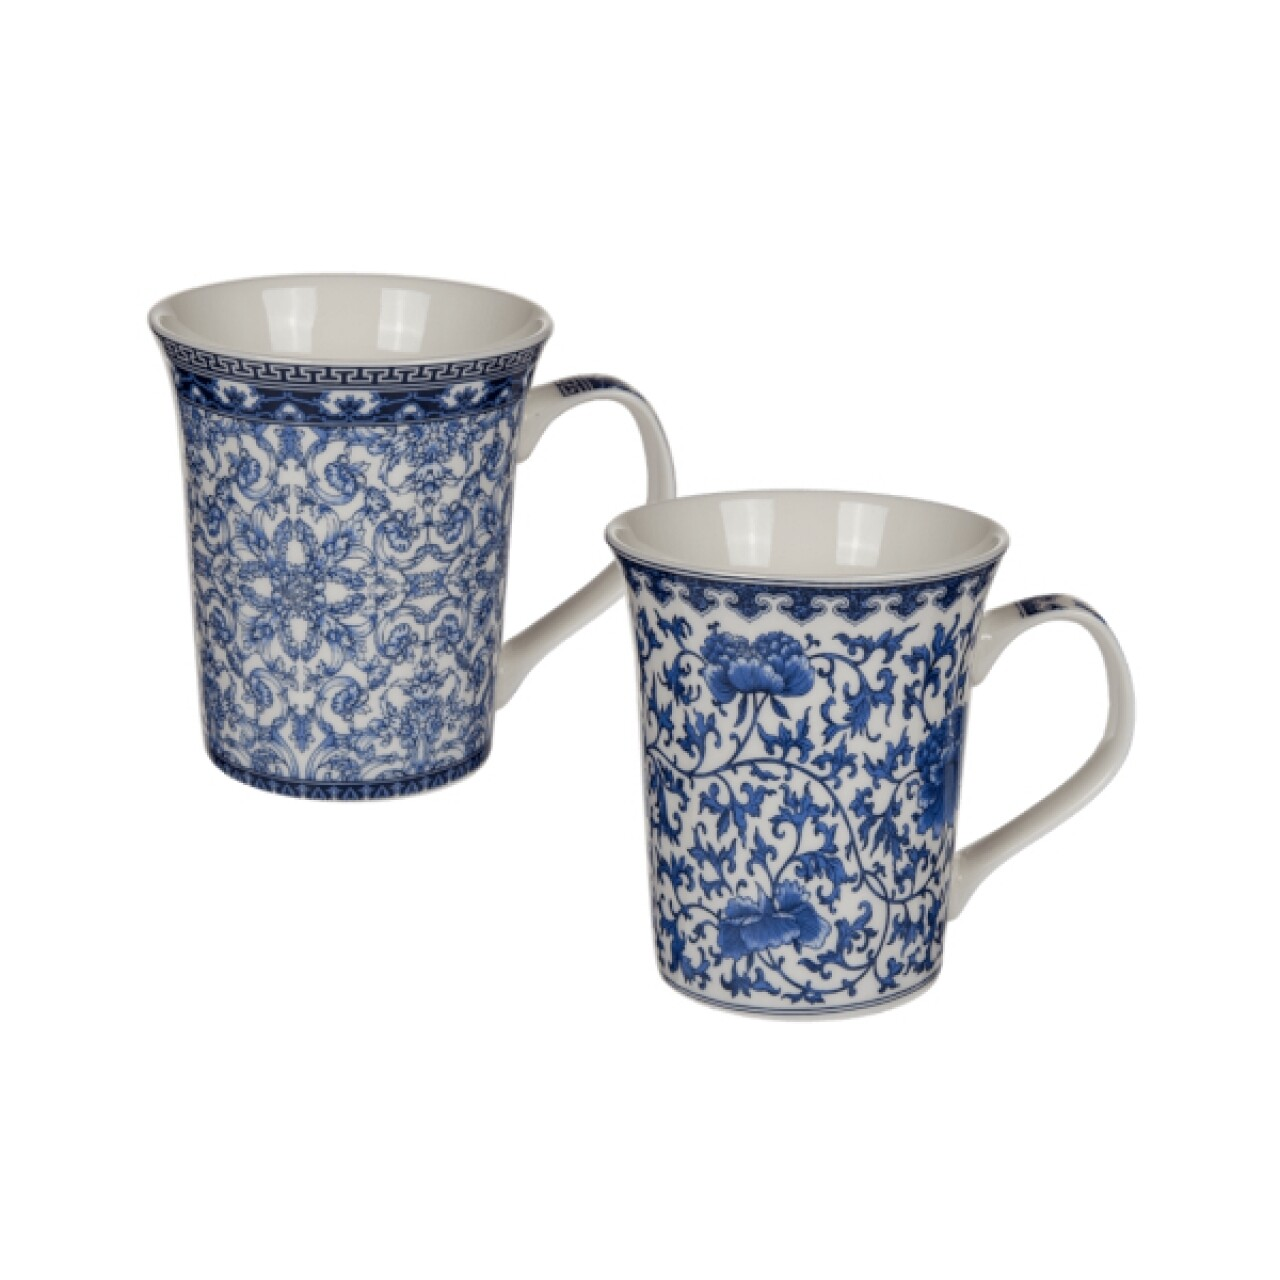 Set 2 cani Blue Flowers, Out of the blue, 250 ml, ceramica, alb/albastru